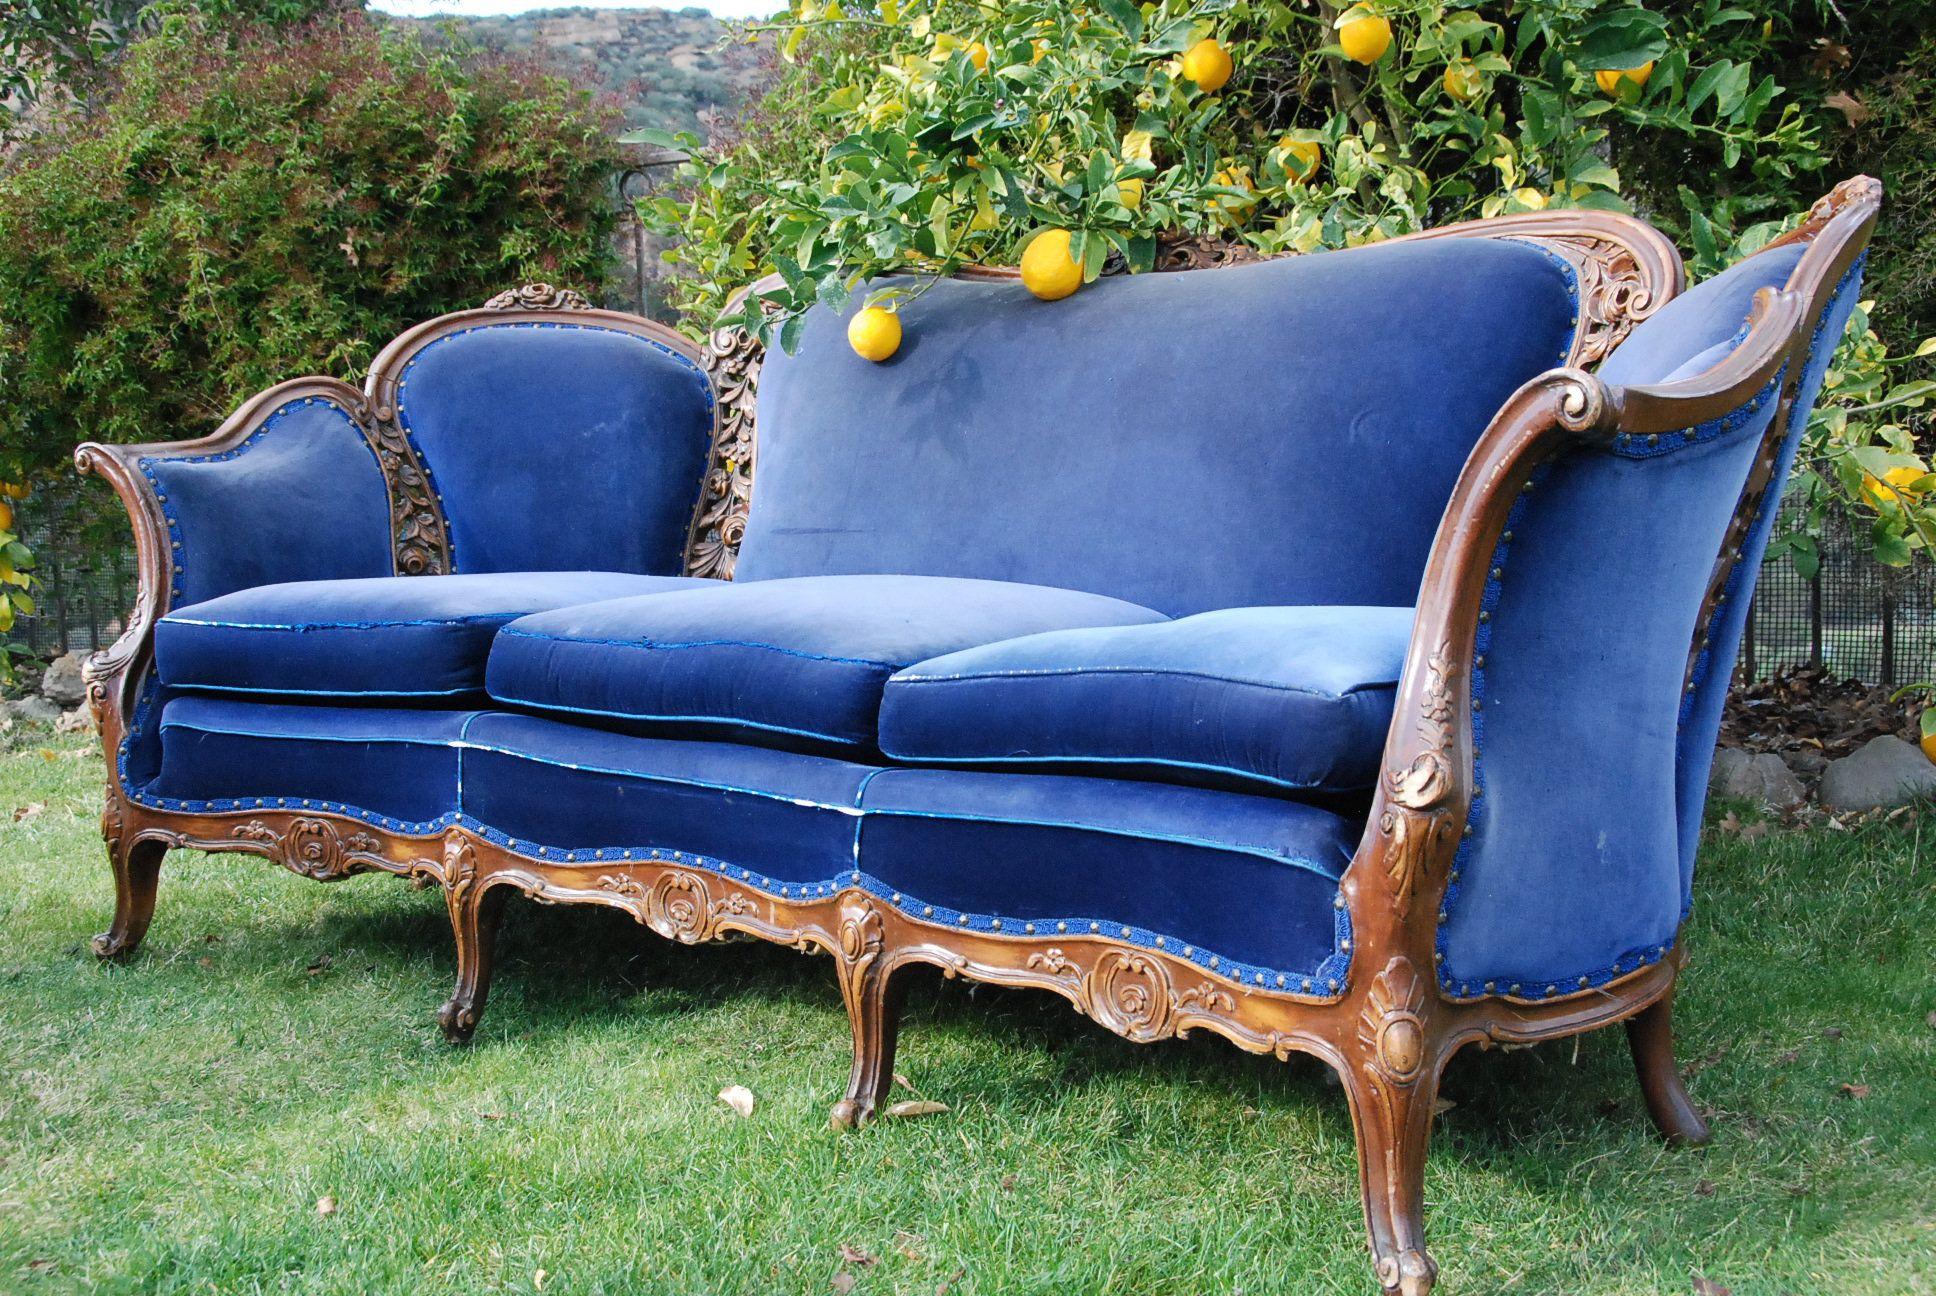 Salt Buffalo Vintage Furniture Rental royal blue velvet sofa